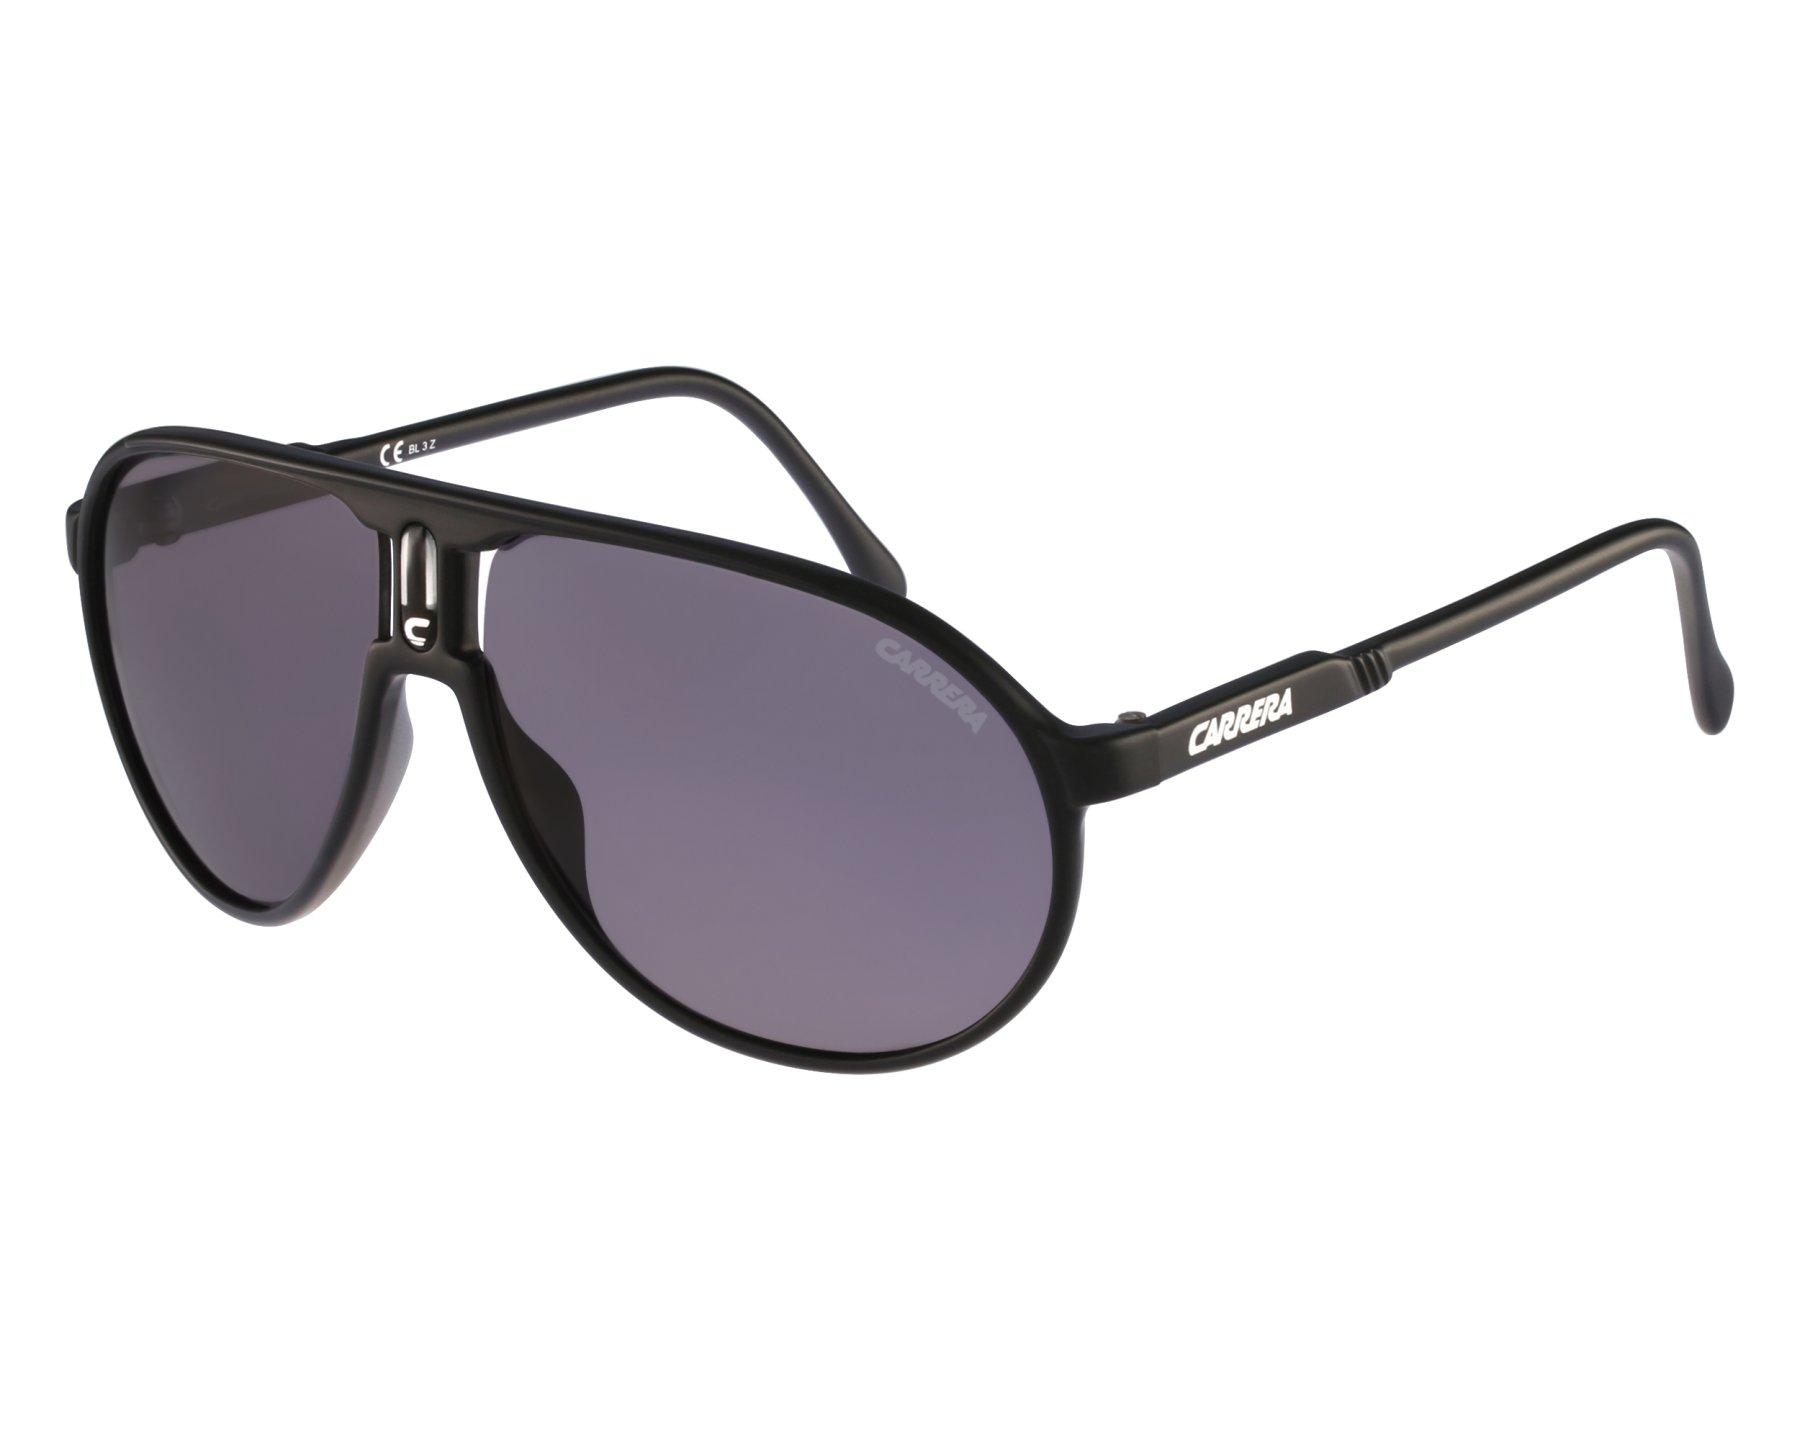 e60601af366 Sunglasses Carrera Champion DL5 3H - Black front view